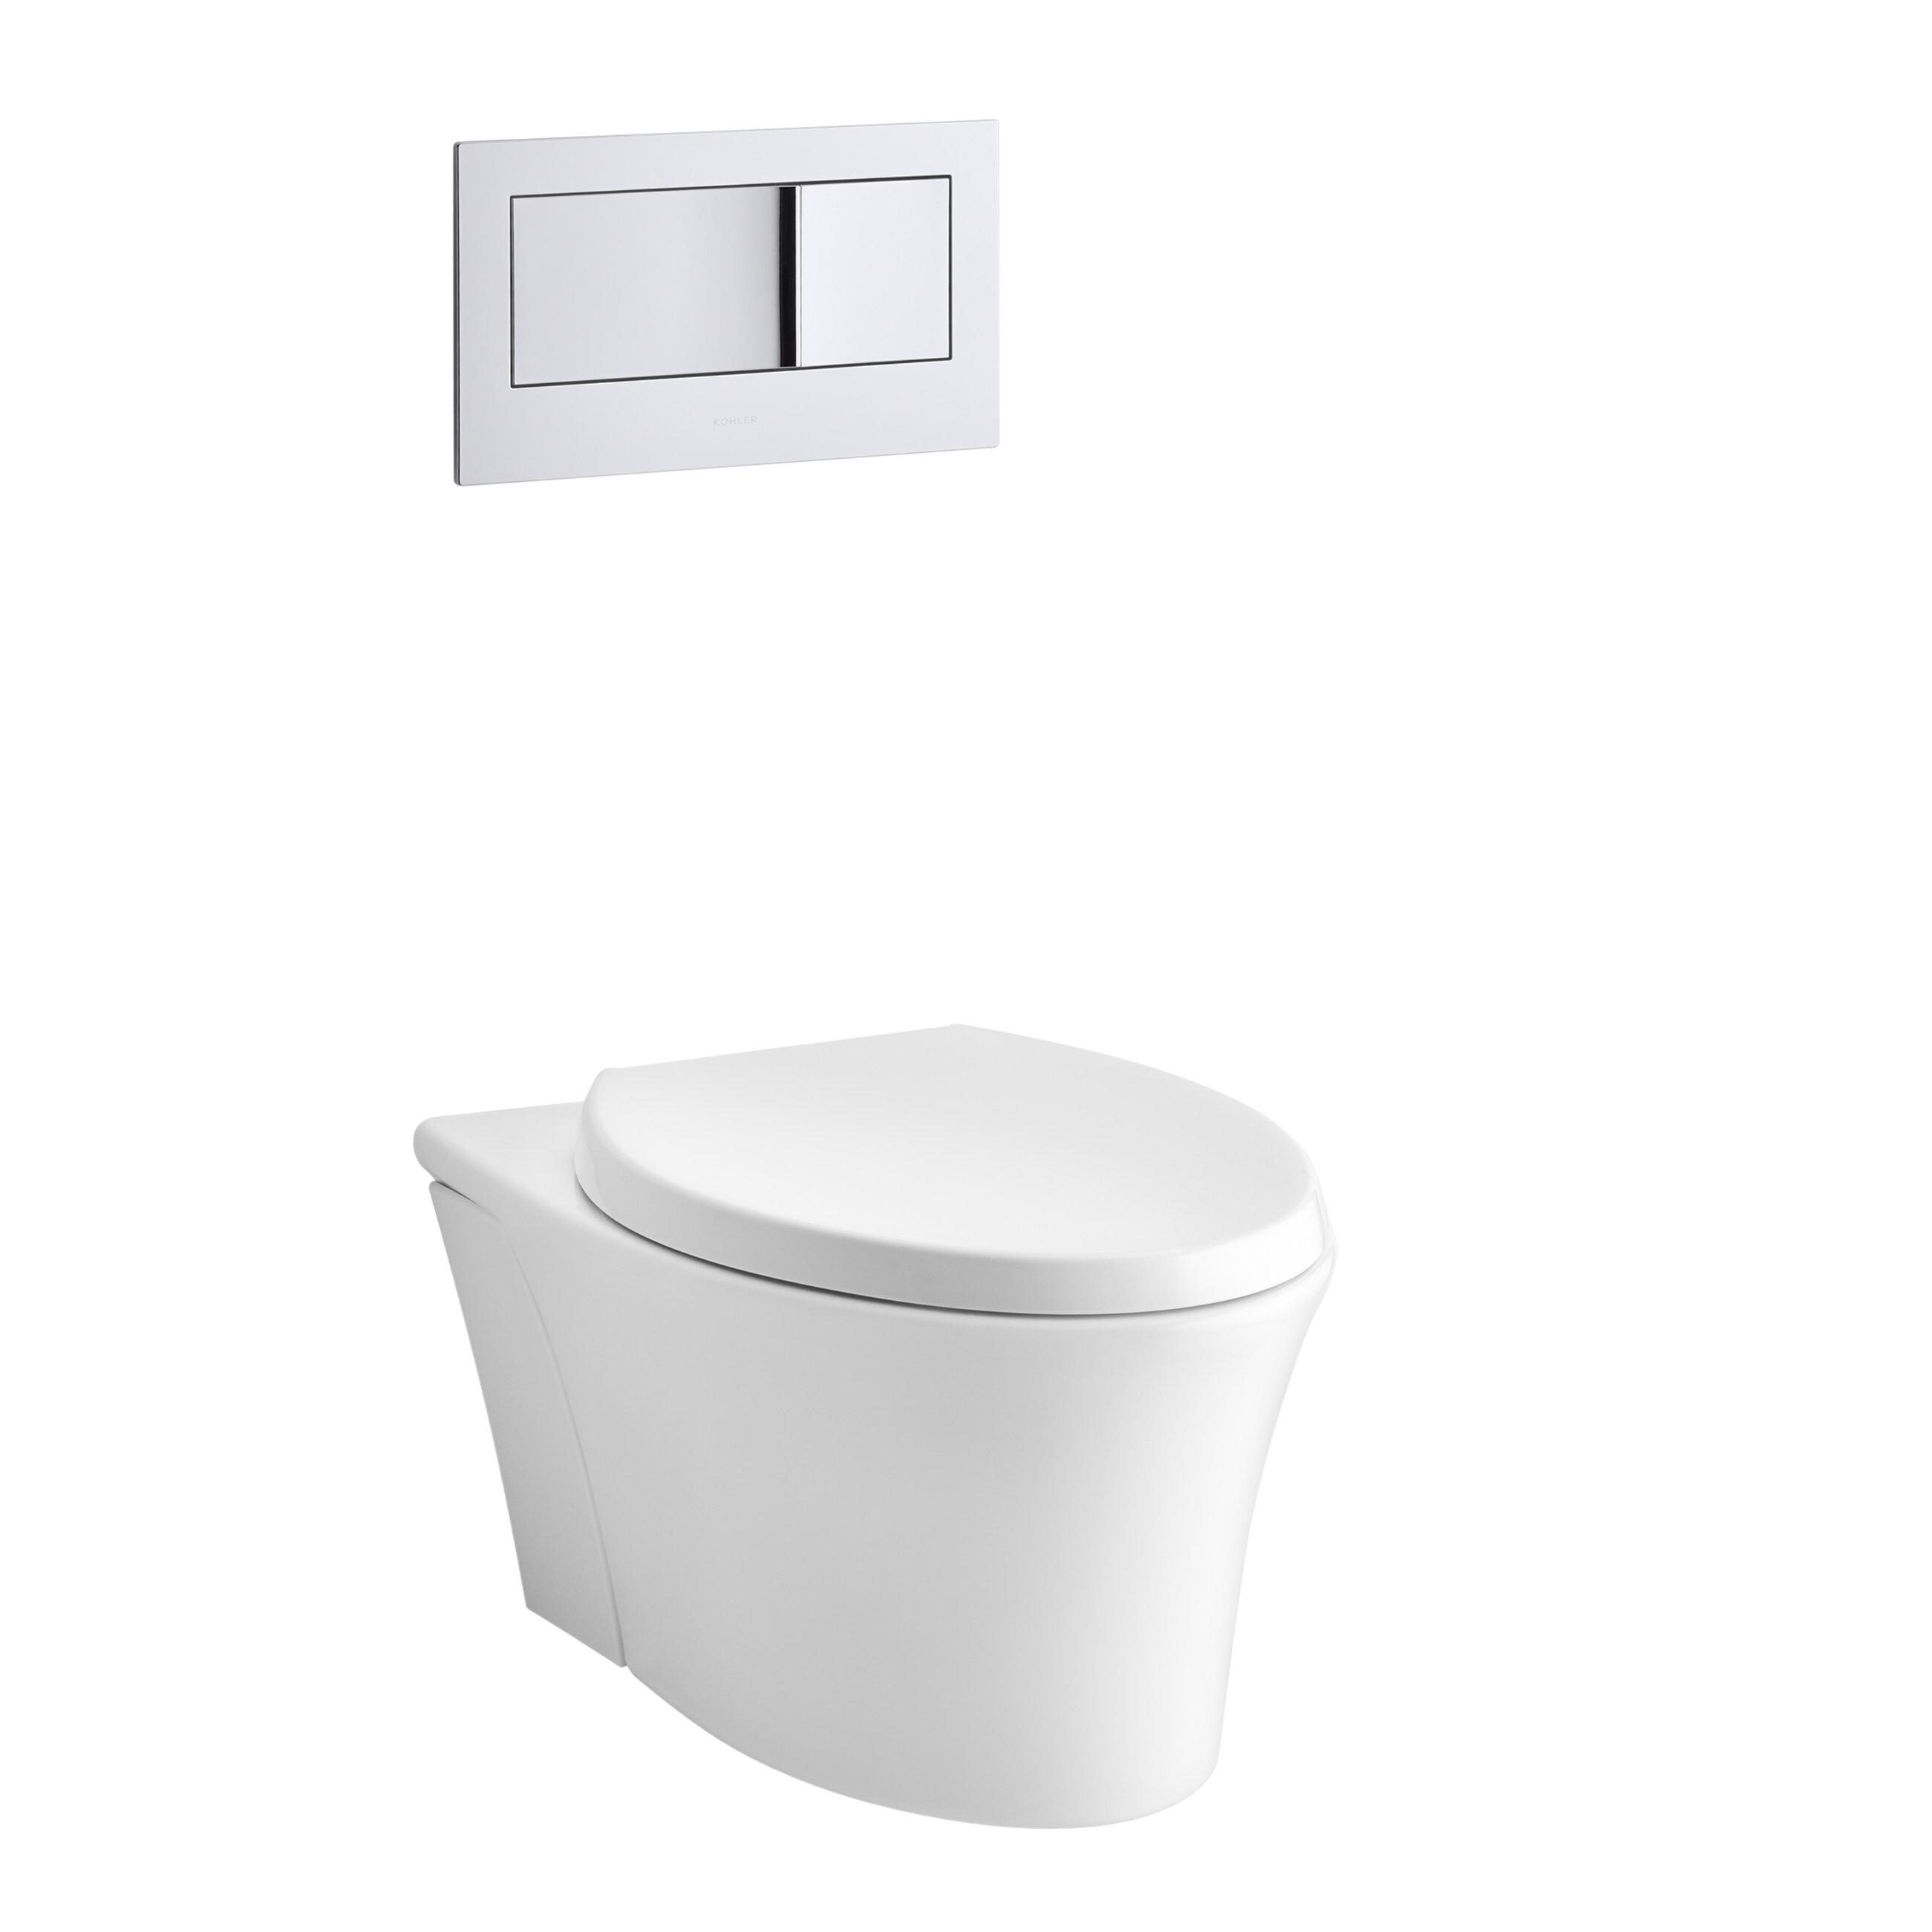 K 6299 0 7 96 Kohler Veil One Piece Elongated Dual Flush Wall Hung Toilet With Reveal Quiet Close Seat Reviews Wayfair